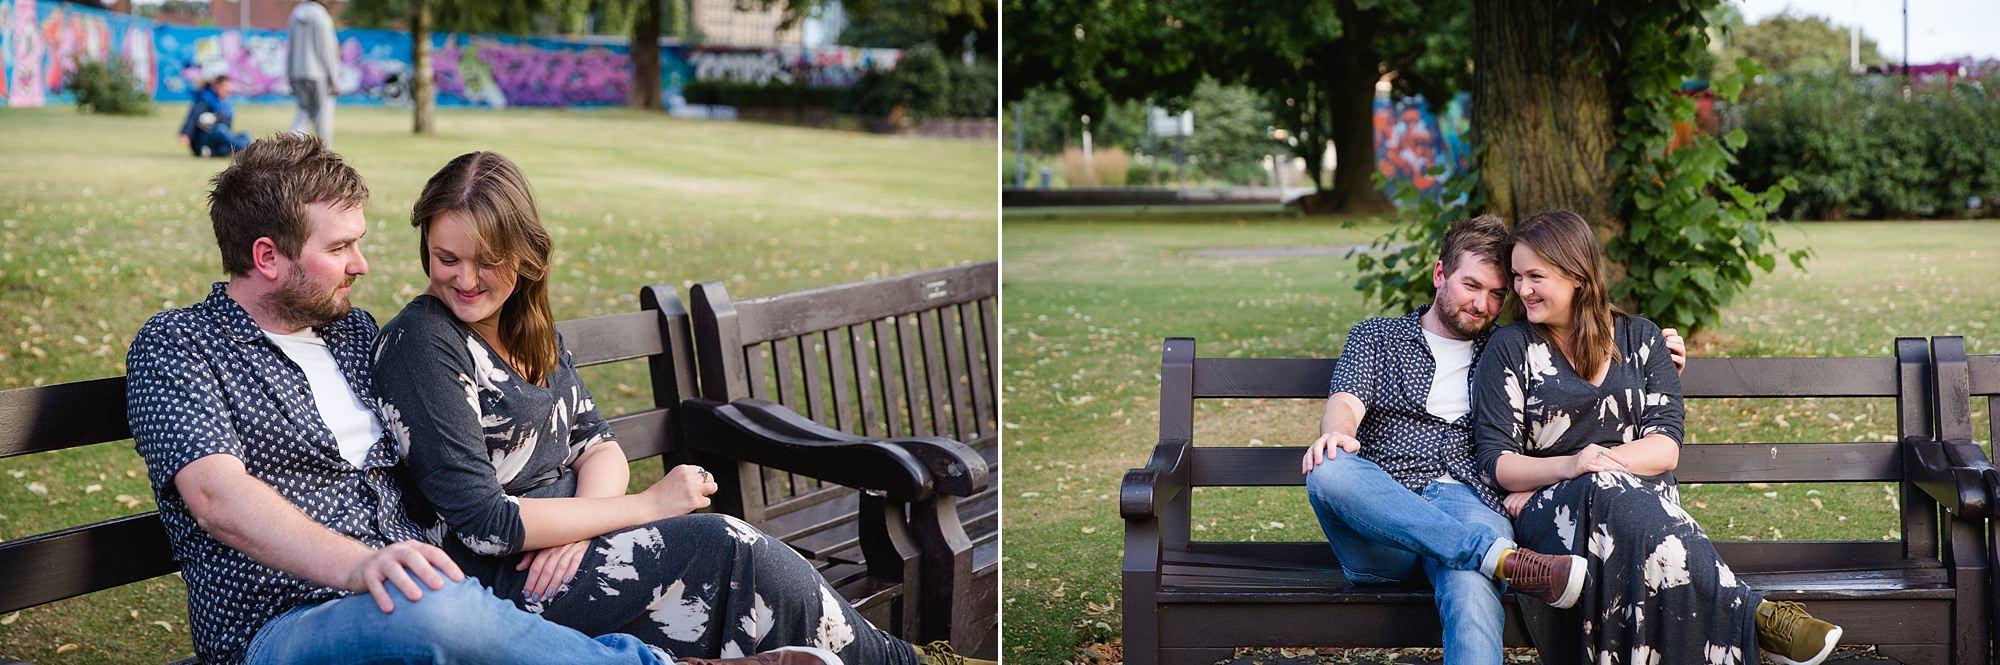 Croydon engagement photography portrait of couple sat on bench